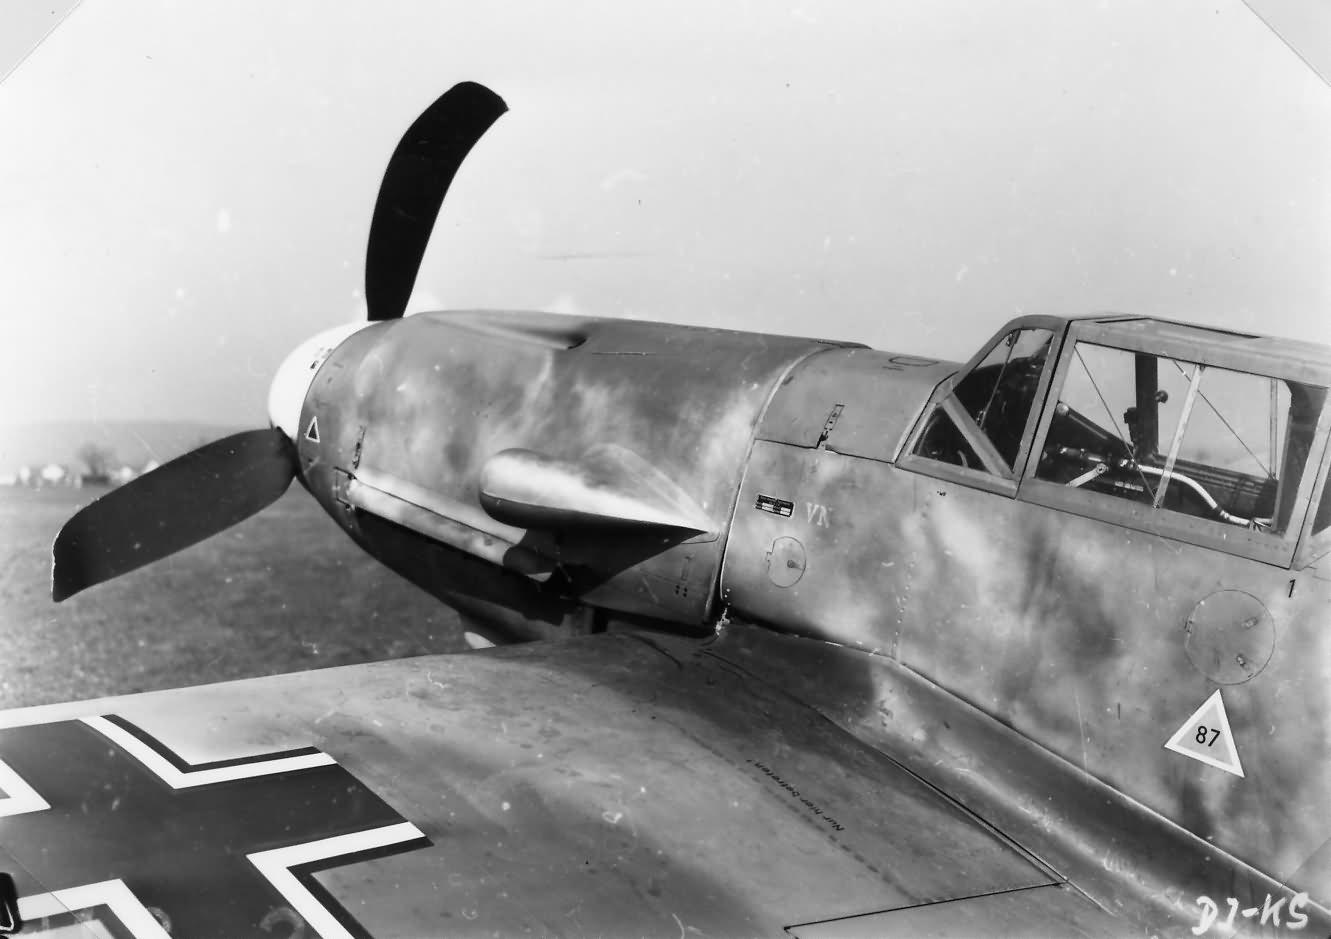 Messerschmitt Bf 109 F Wiener Neustadter Flugzeugwerke 114